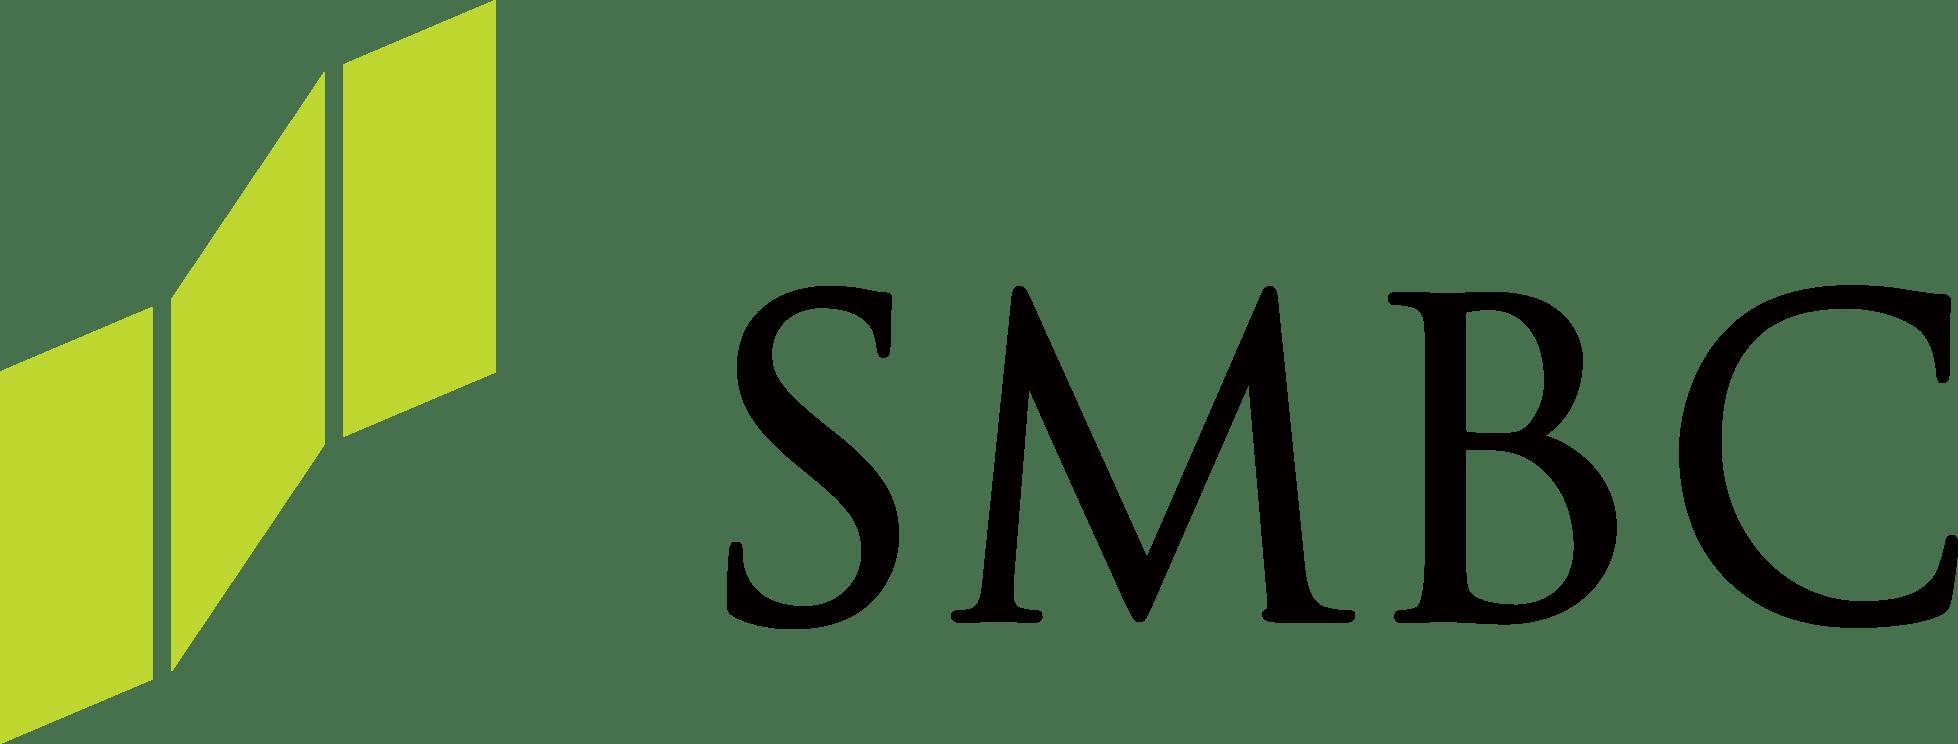 Sumitomo Mitsui Financial Logo png